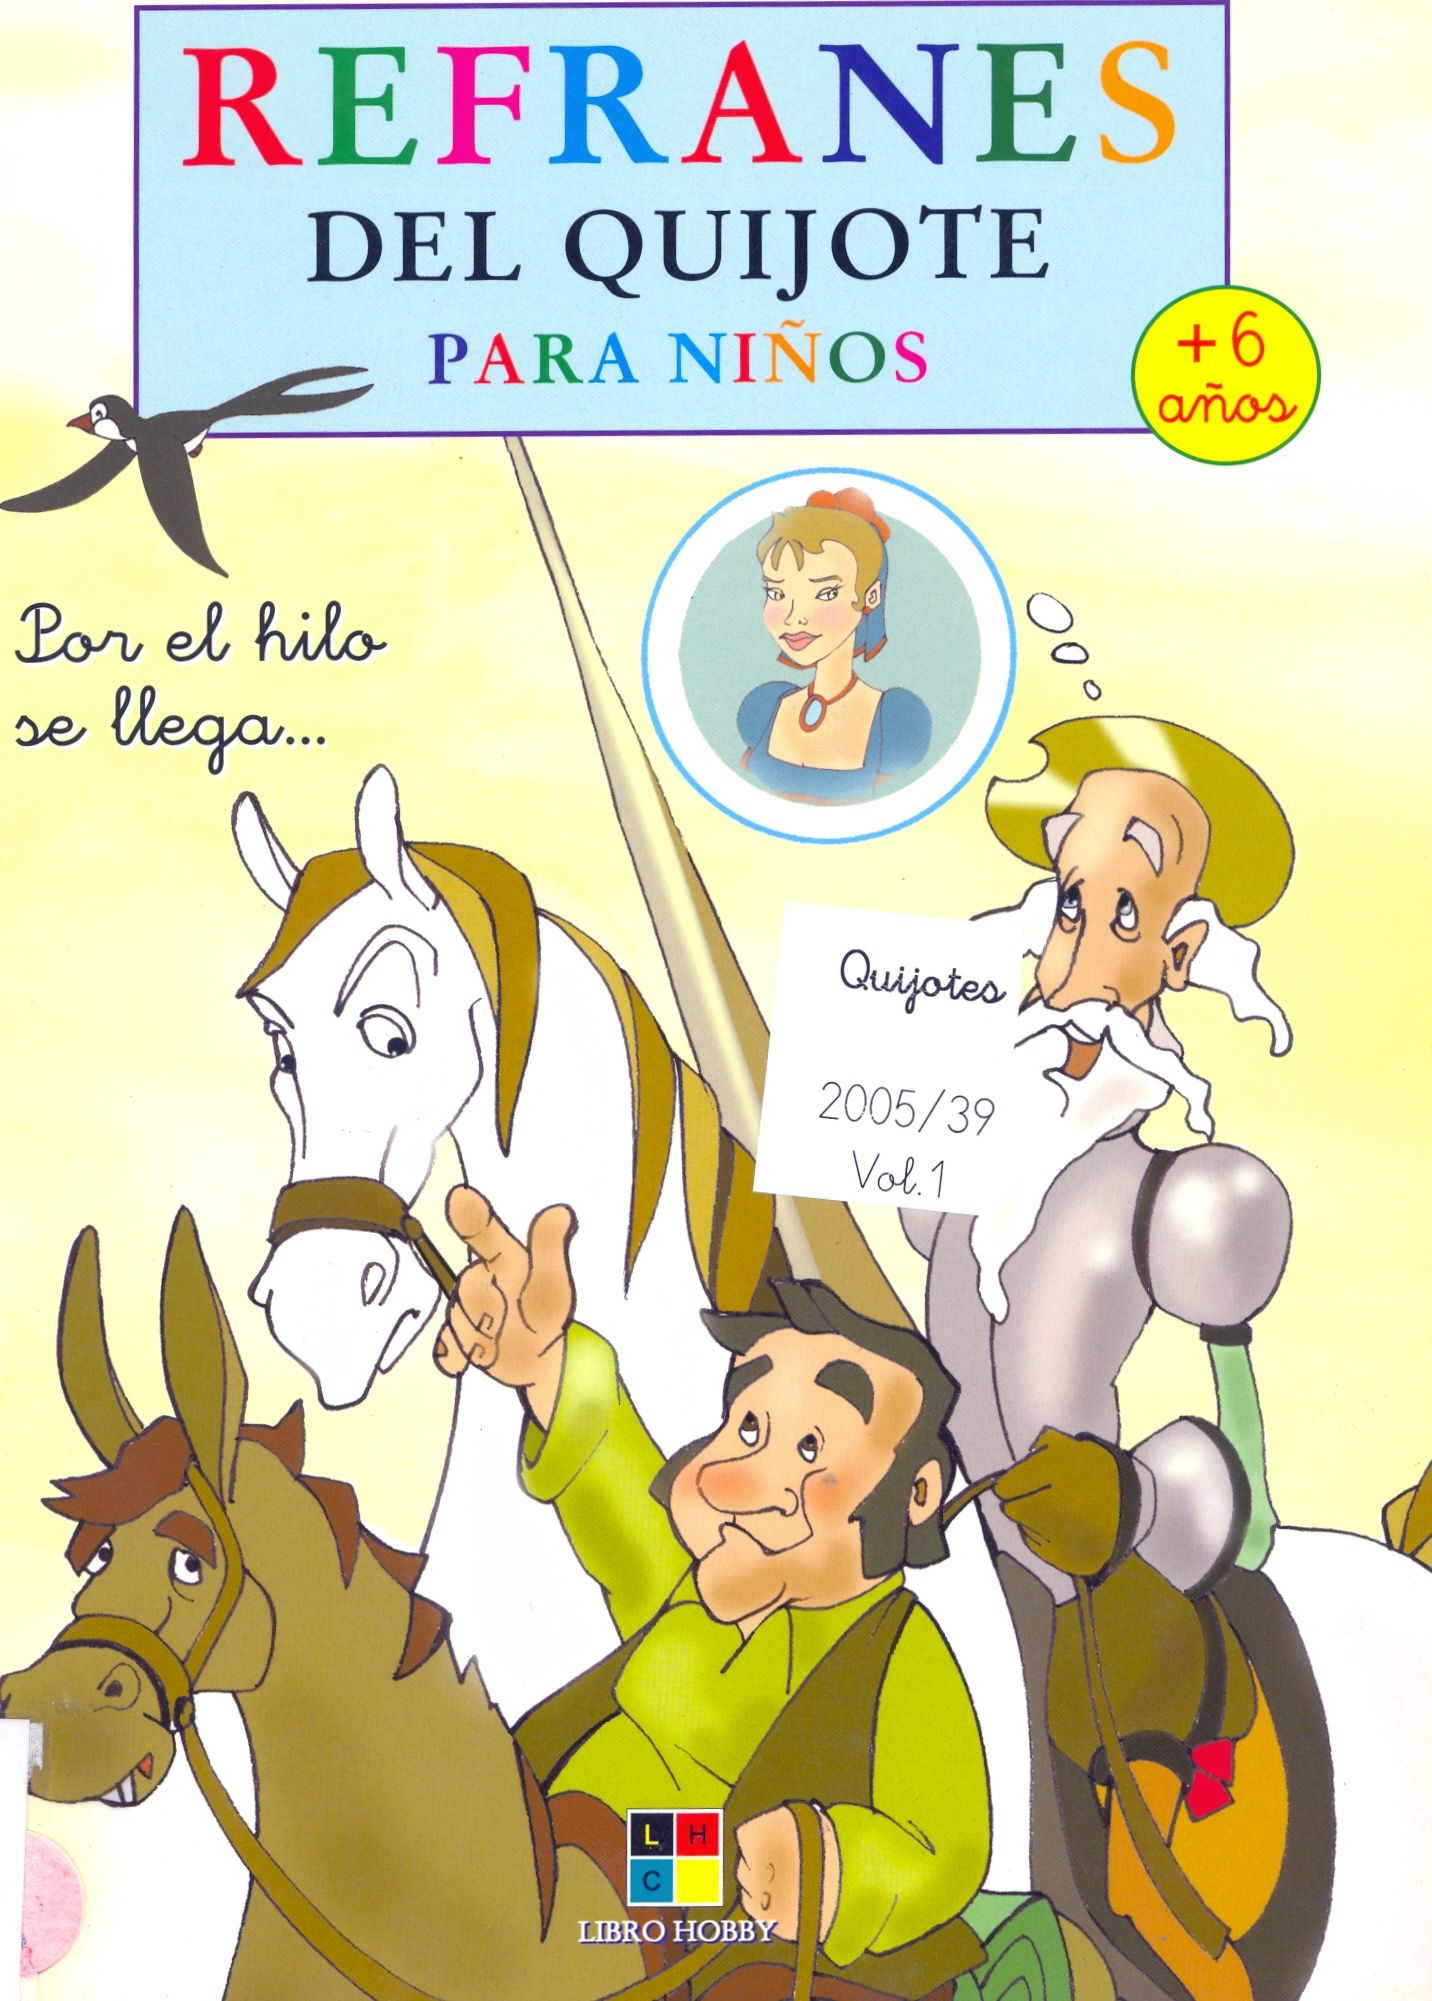 Refranes Del Quijote Para Ninos Adapt J Leyva Il S Aguilar